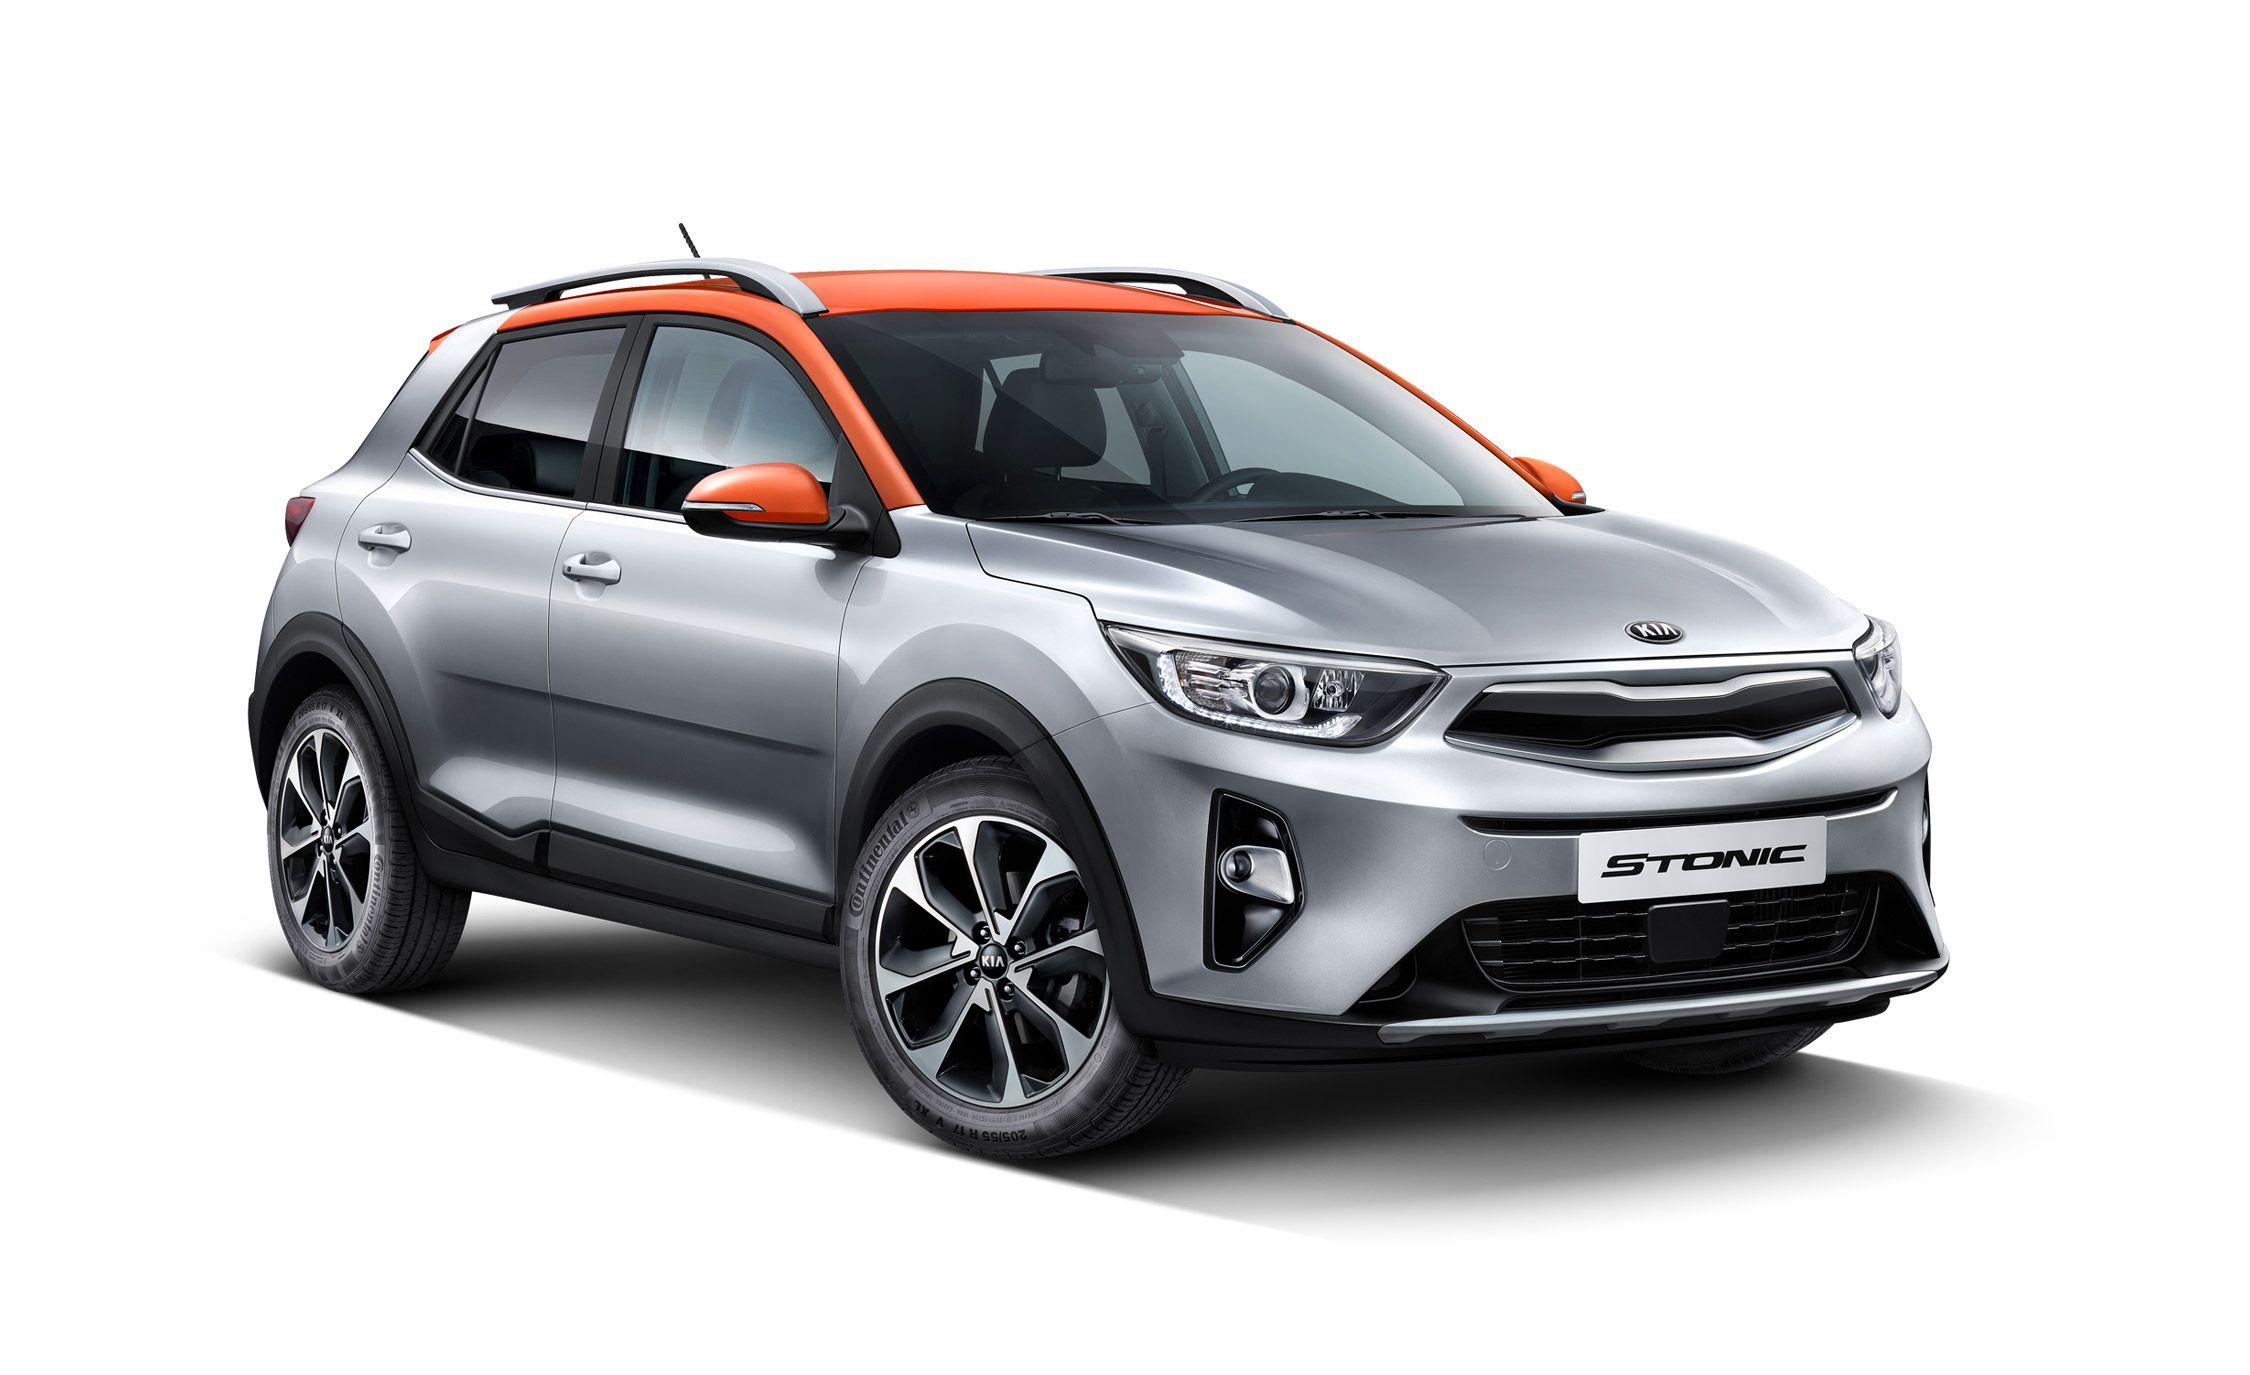 New Cars for 2018: Kia